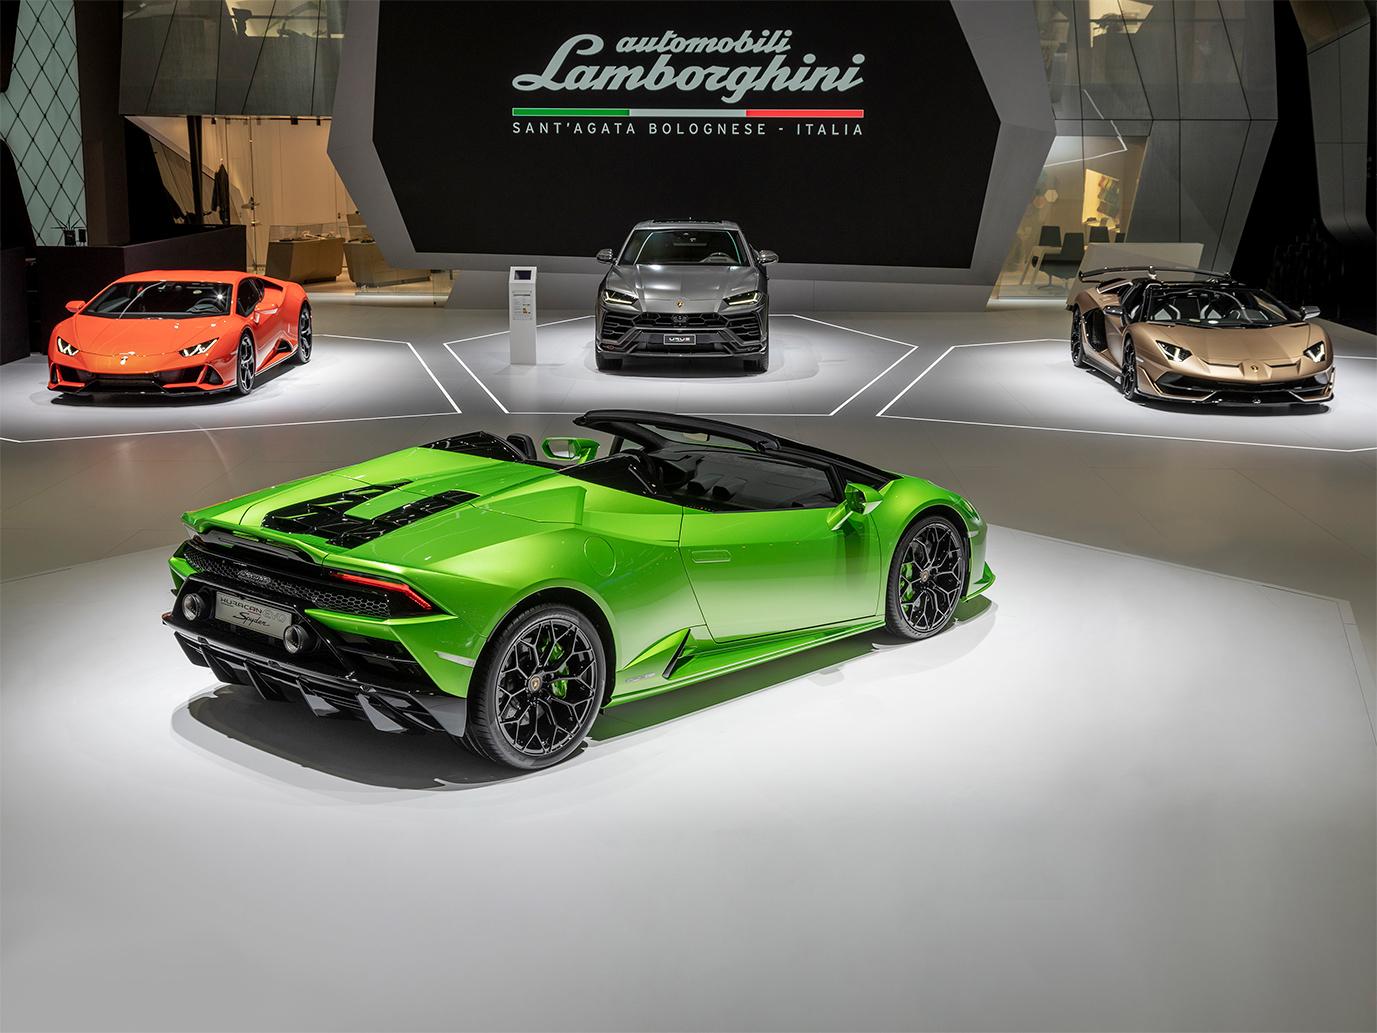 TrackWorthy - Automobili Lamborghini 2019 Geneva International Motor Show (2)